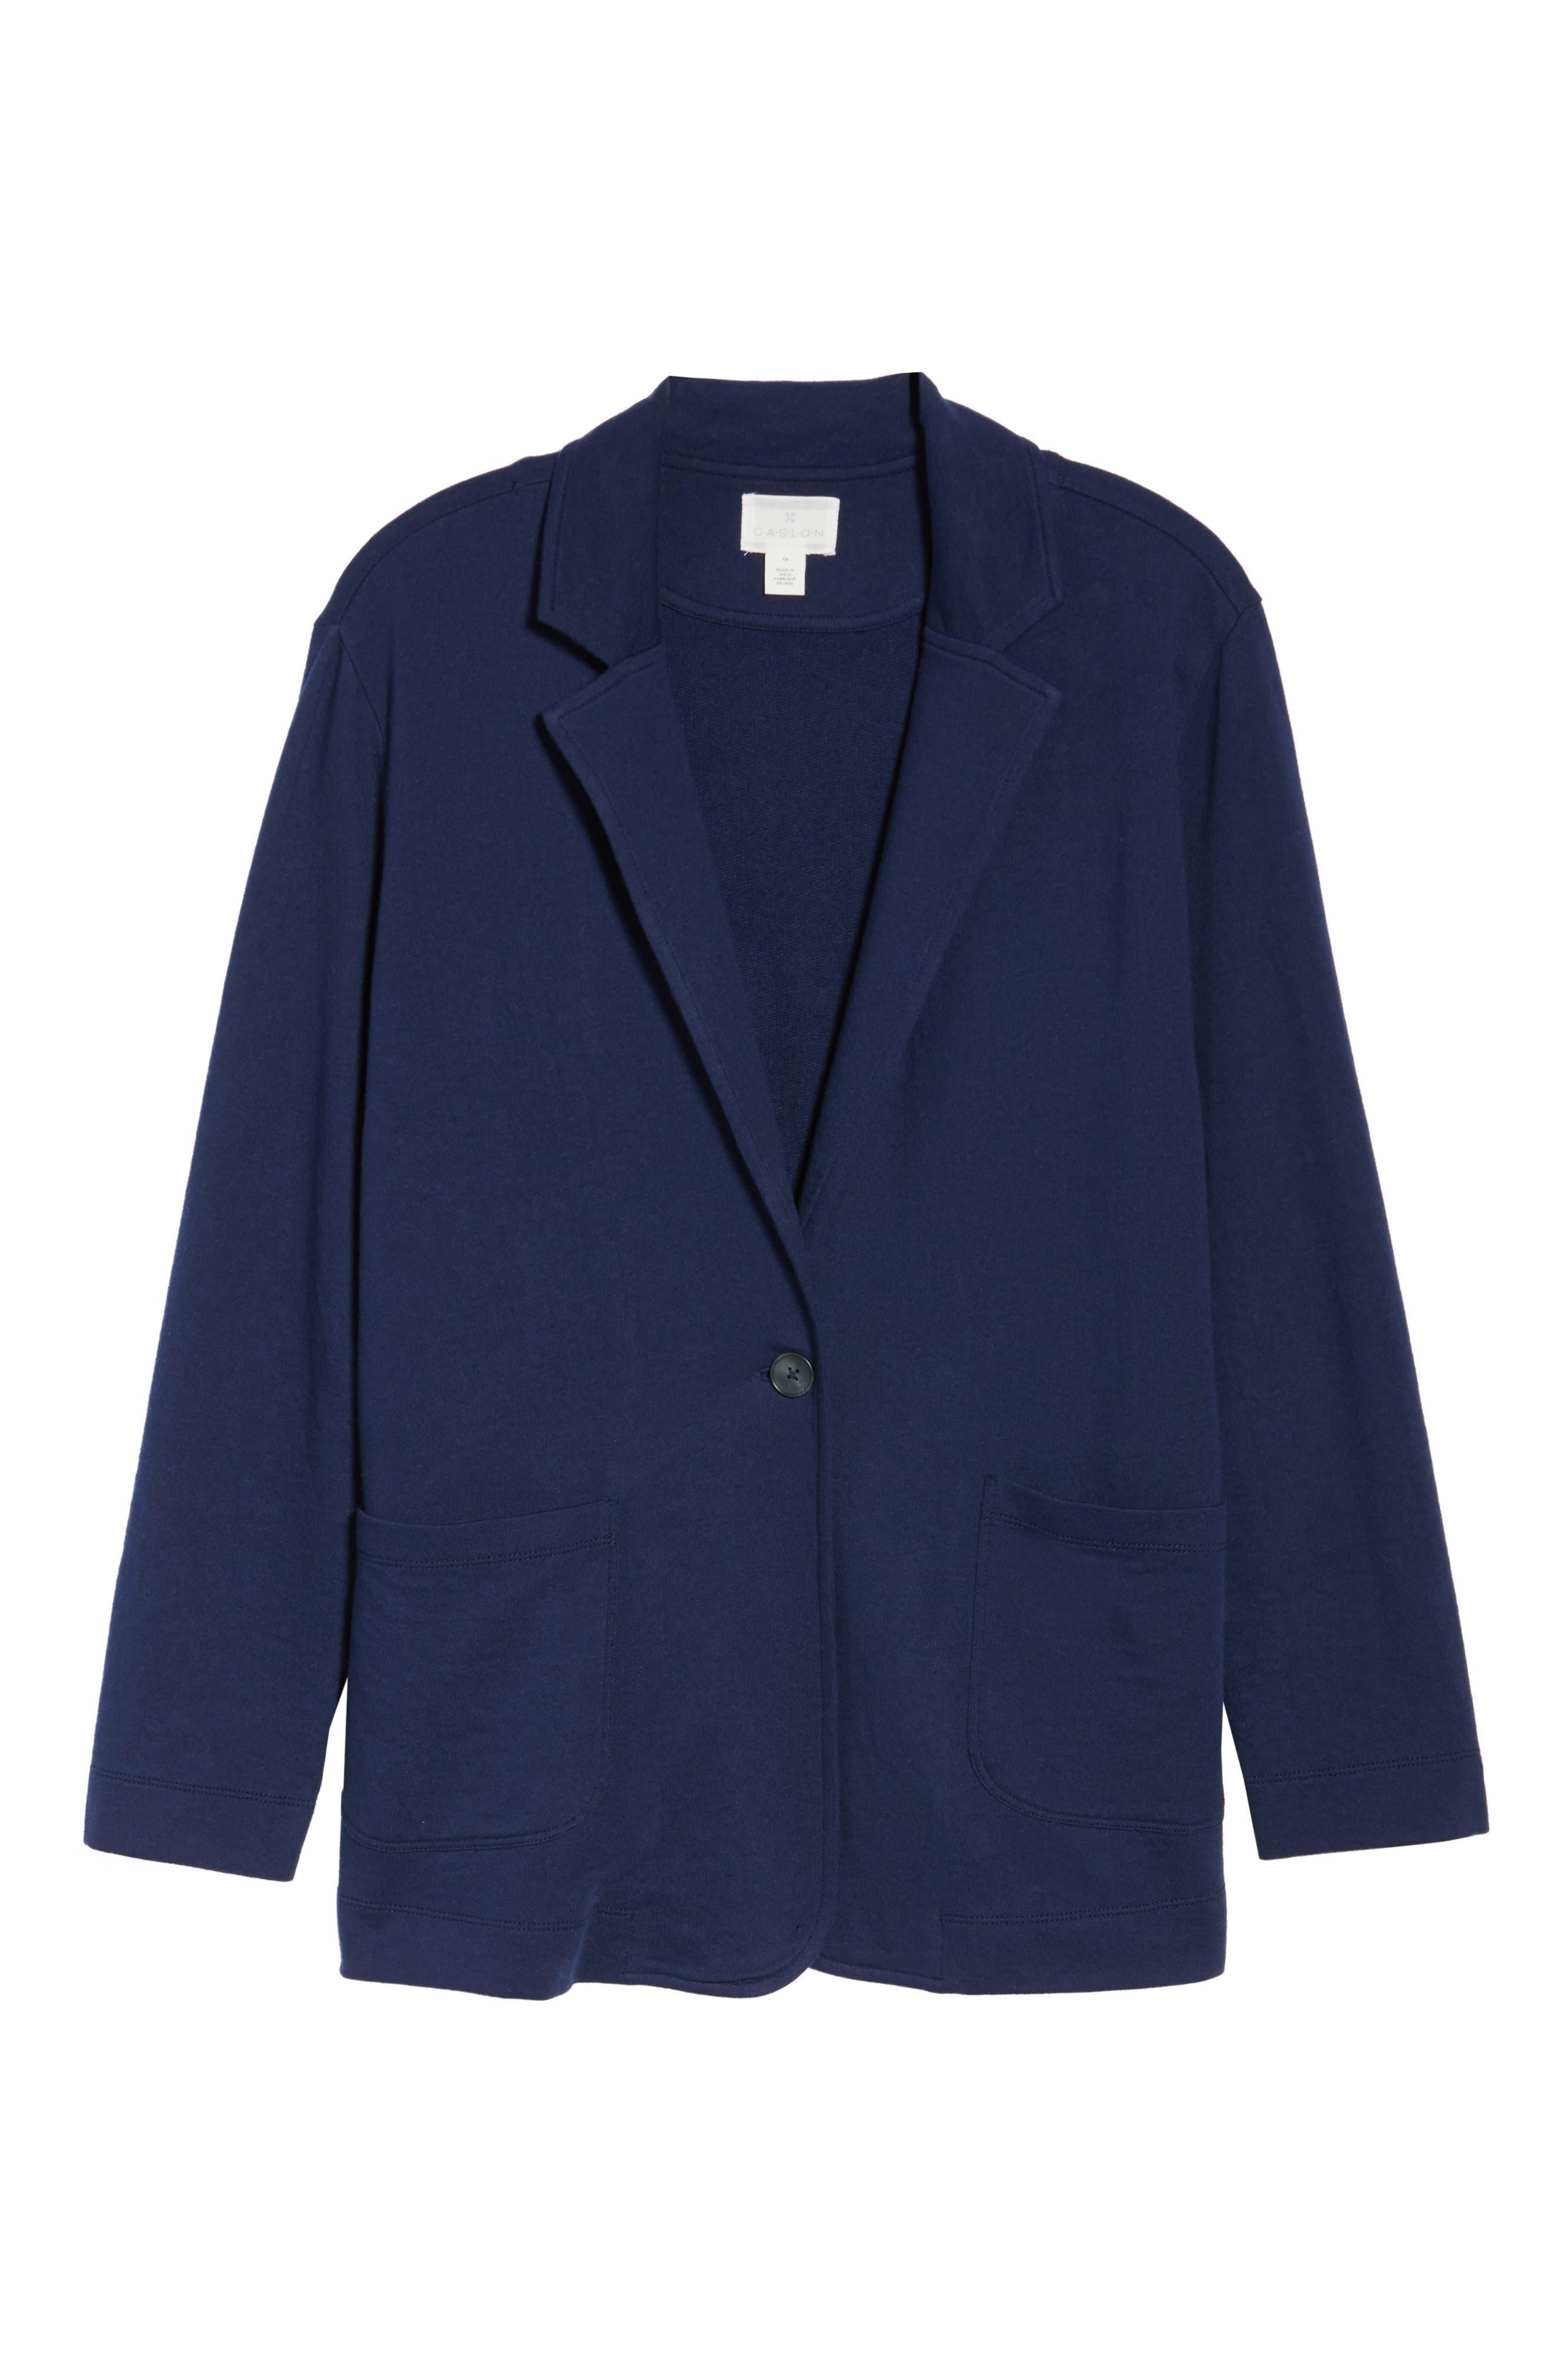 CASLON<SUP>®</SUP>, Double Pocket Knit Blazer, Alternate thumbnail 6, color, NAVY PEACOAT